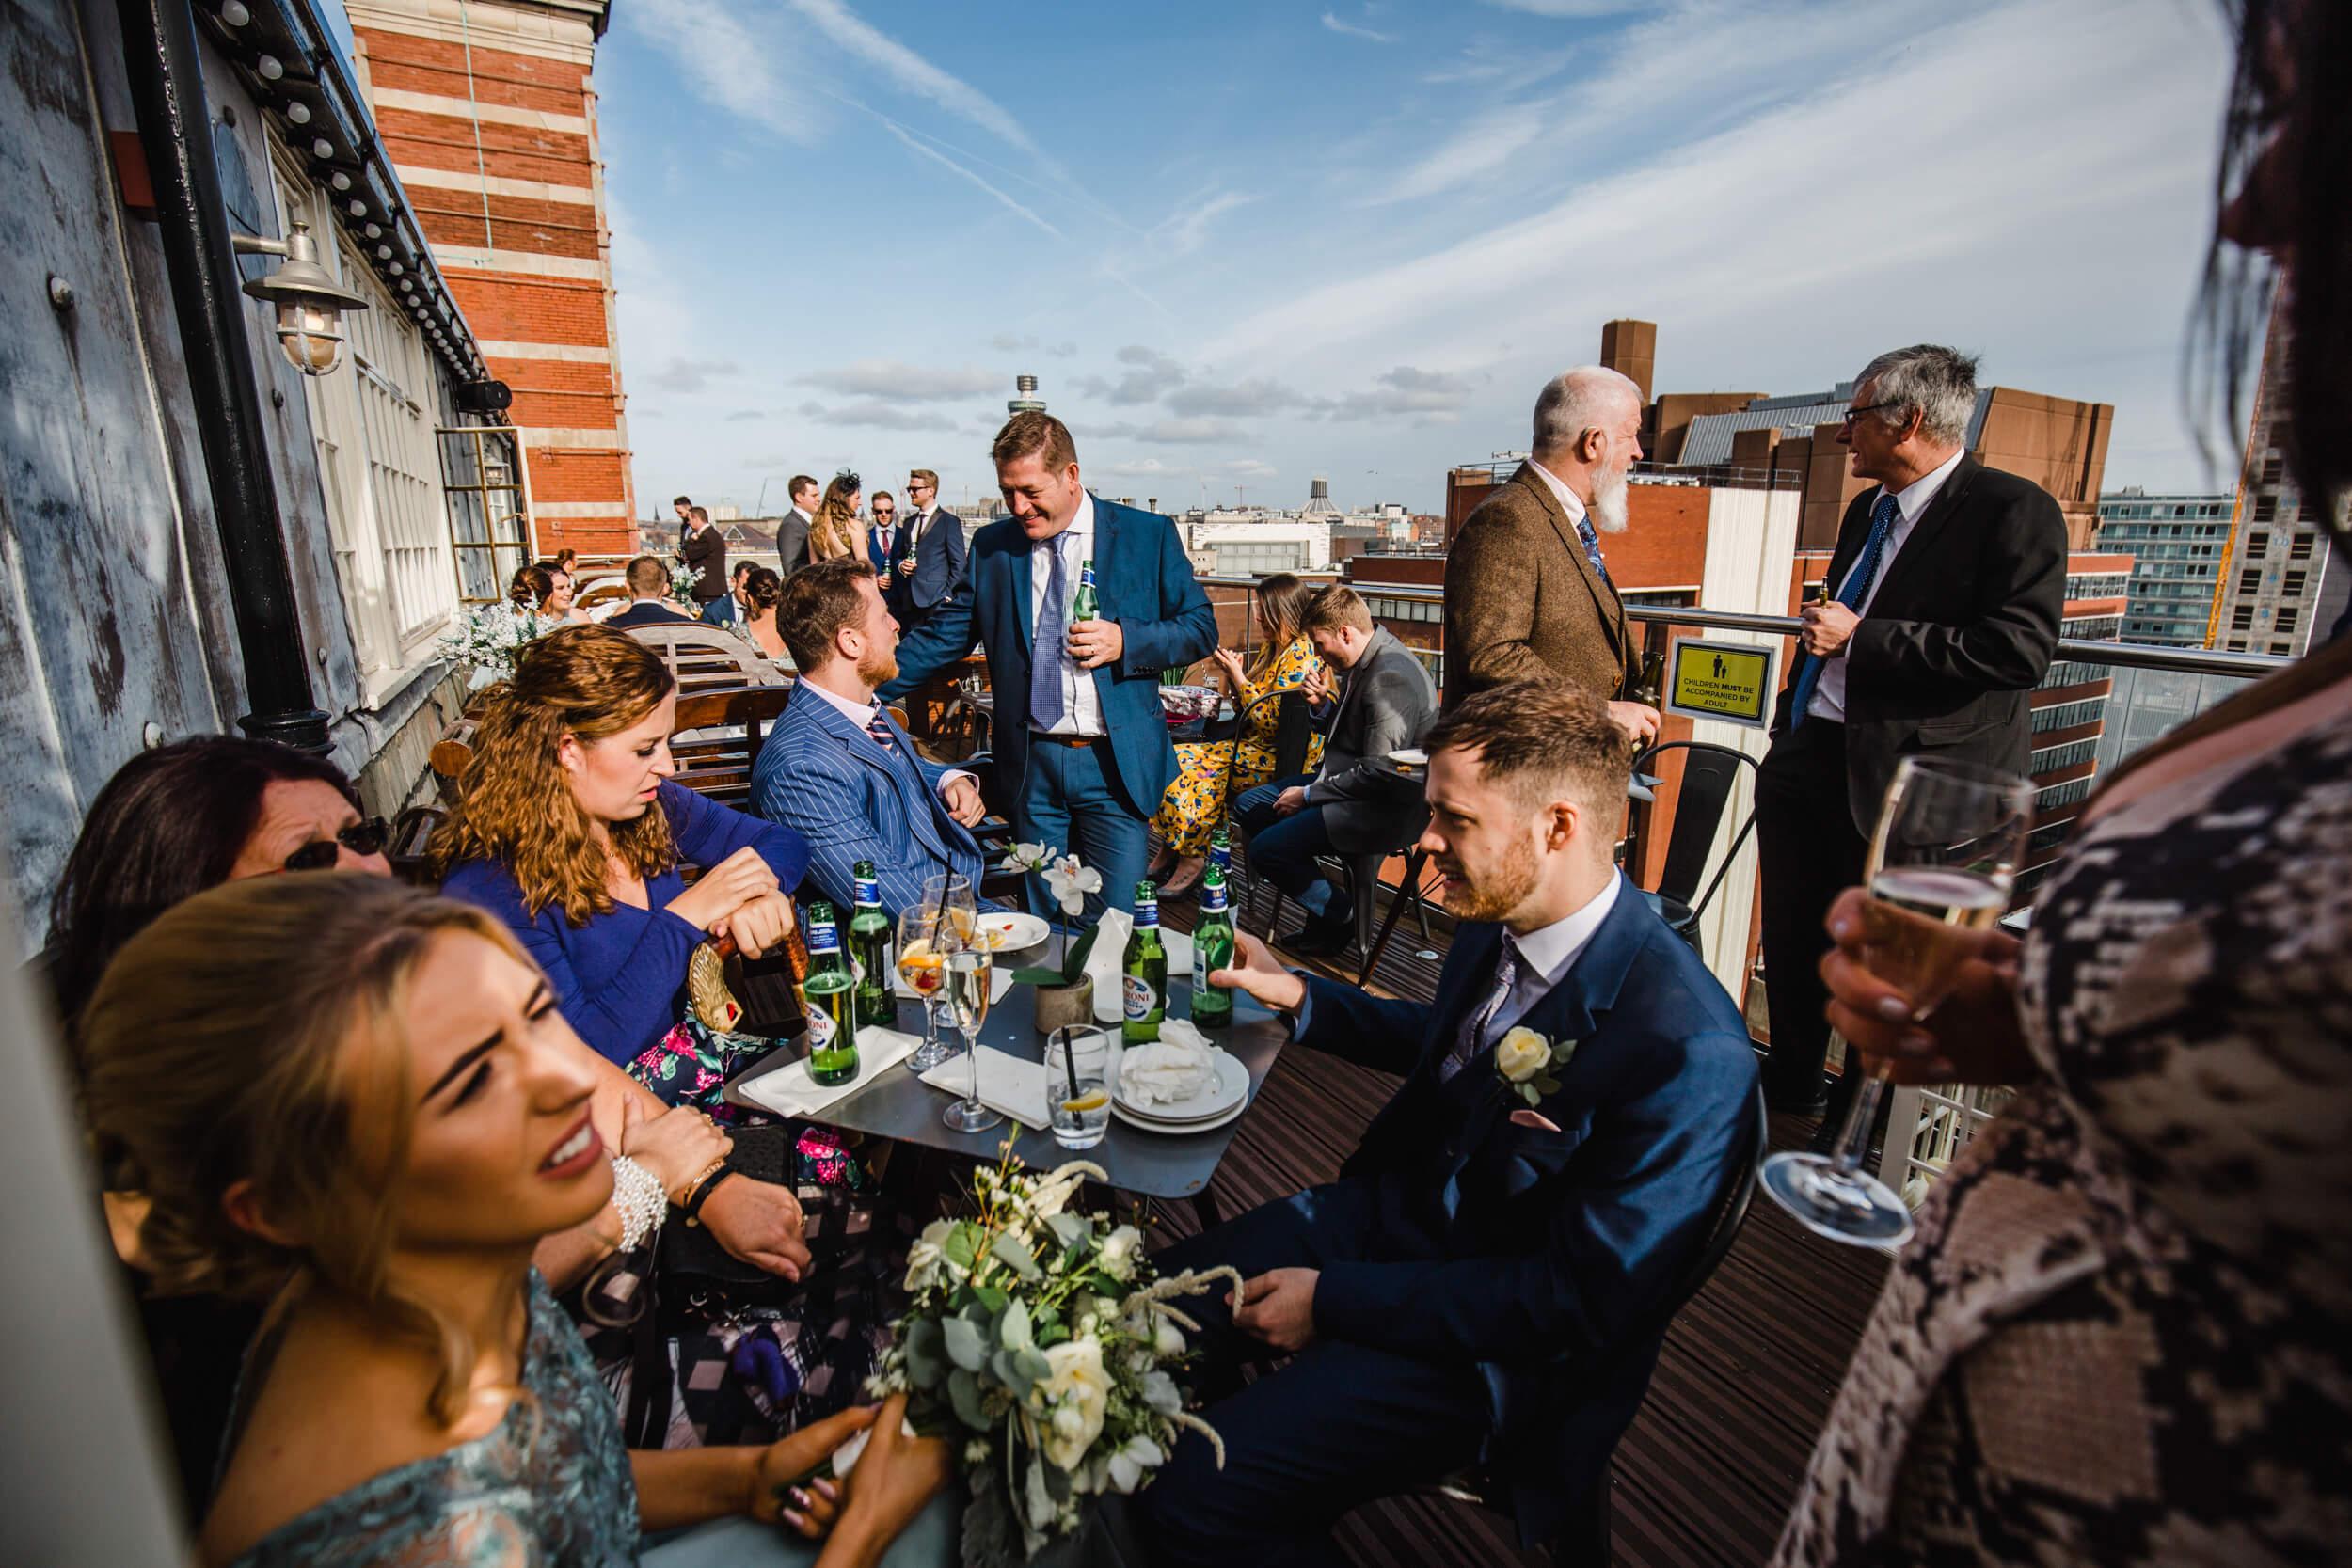 30_James_Street_Hotel_Wedding_Venue_033.jpg